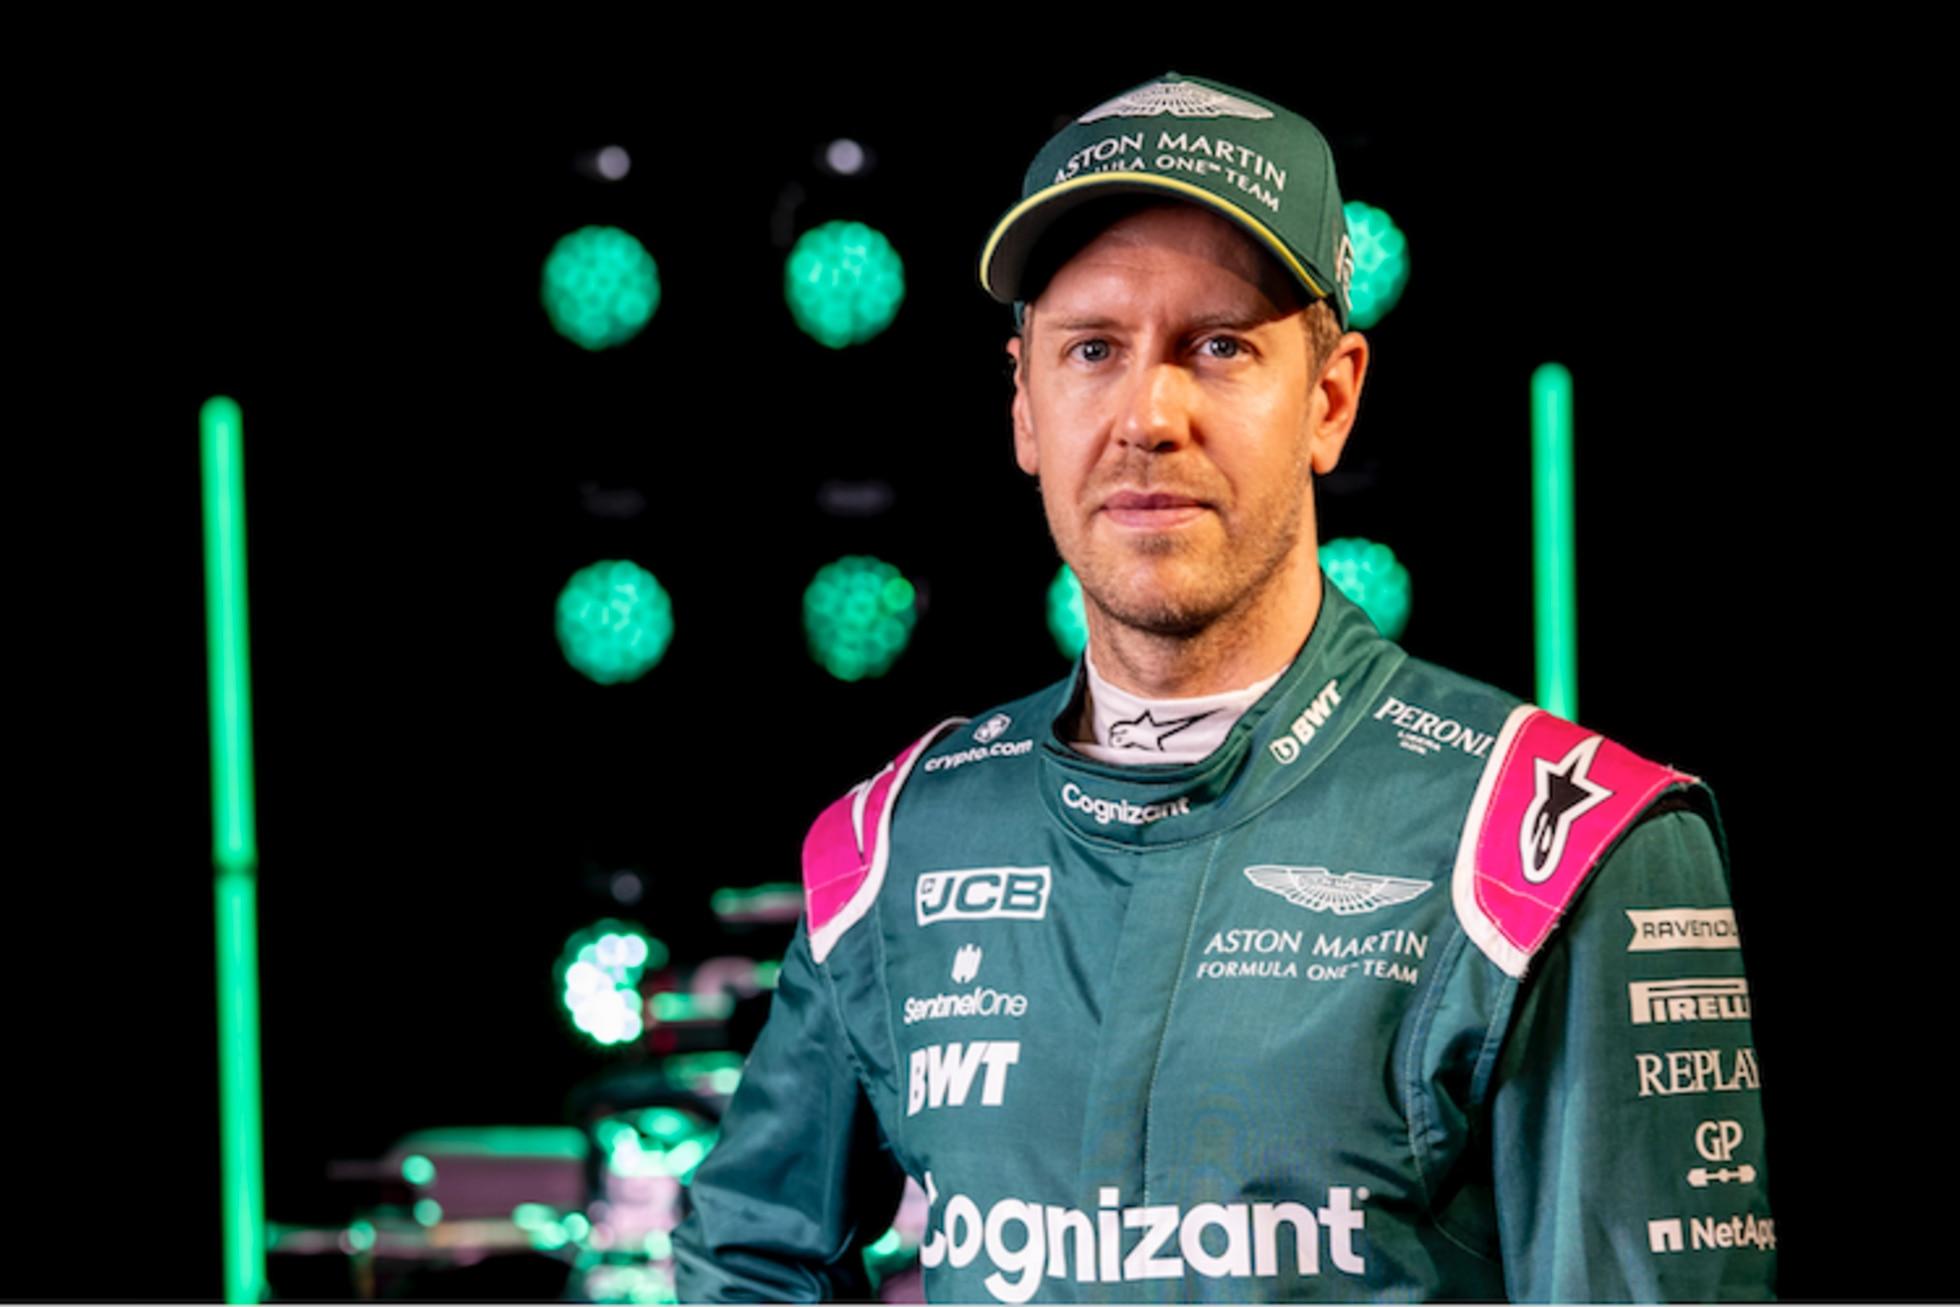 Sebastian Vettel Vor Aston Martin Test Hartes Urteil Formel 1 Speedweek Com